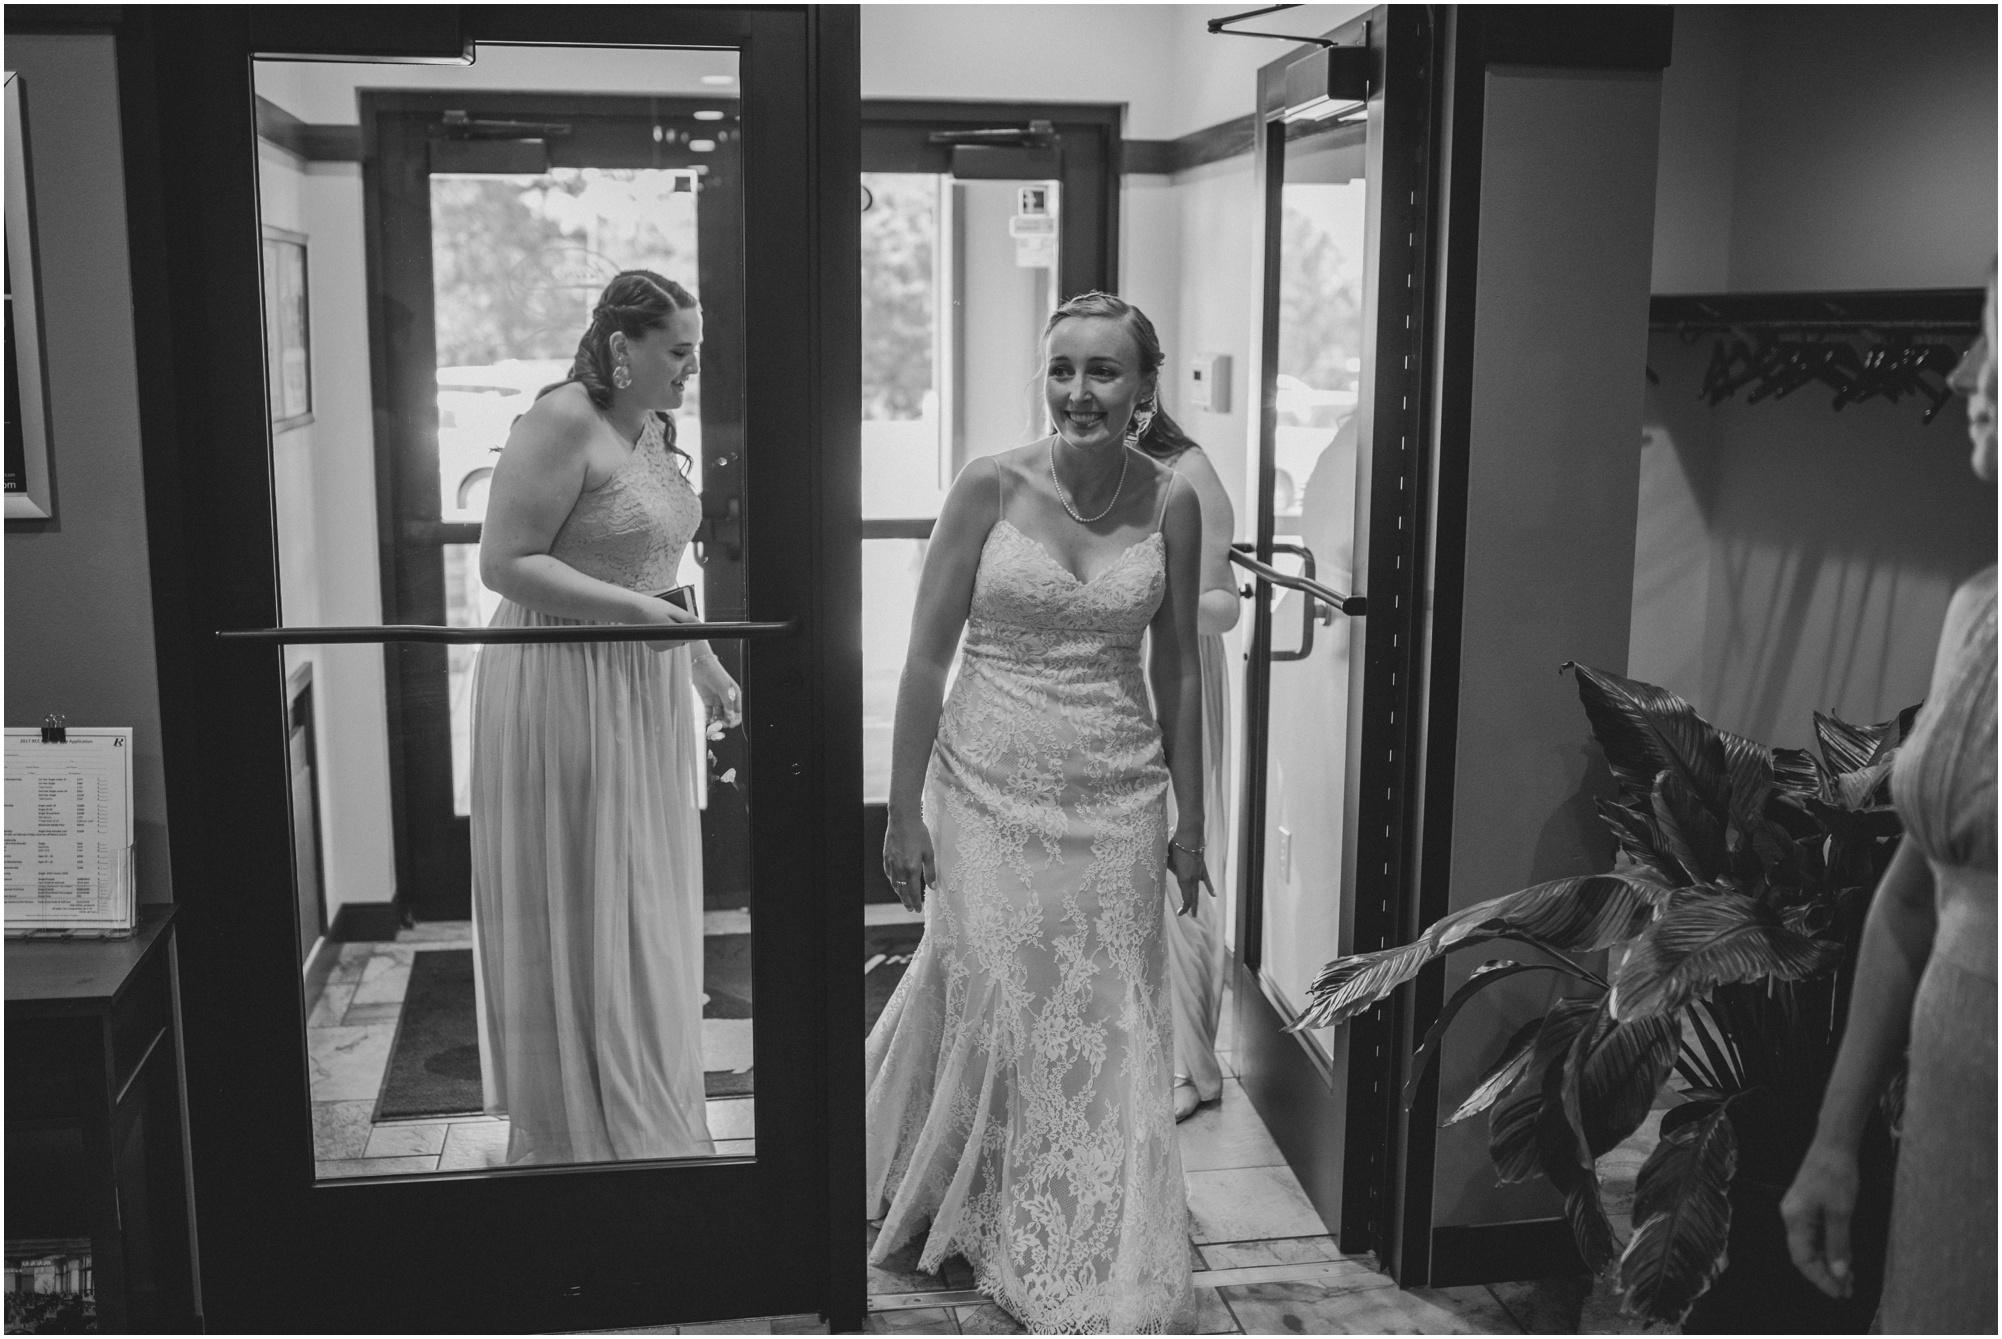 Wisconsin-Wedding-Photographer-Reedsburg-Country-Club-Kaela-and Matt-Wedding-23.jpg